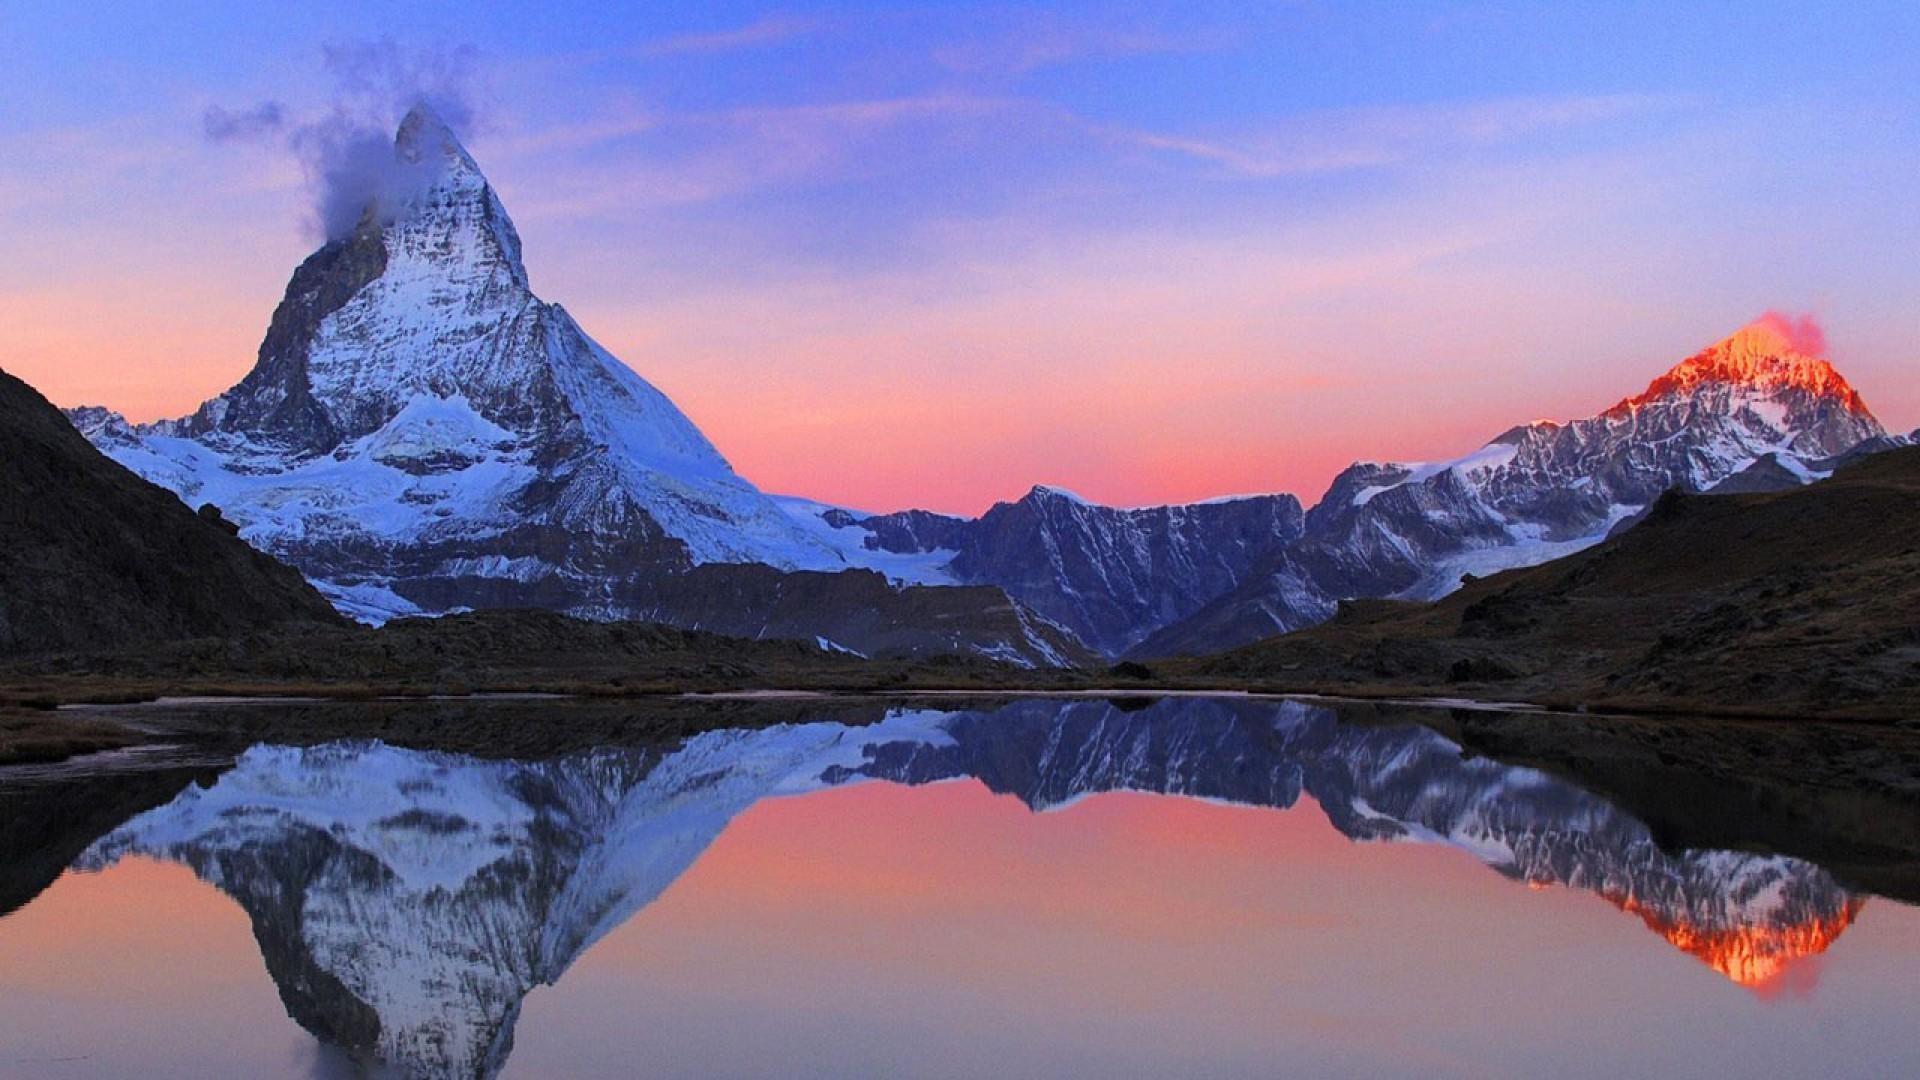 Mountain Desktop Wallpapers 73 Pictures